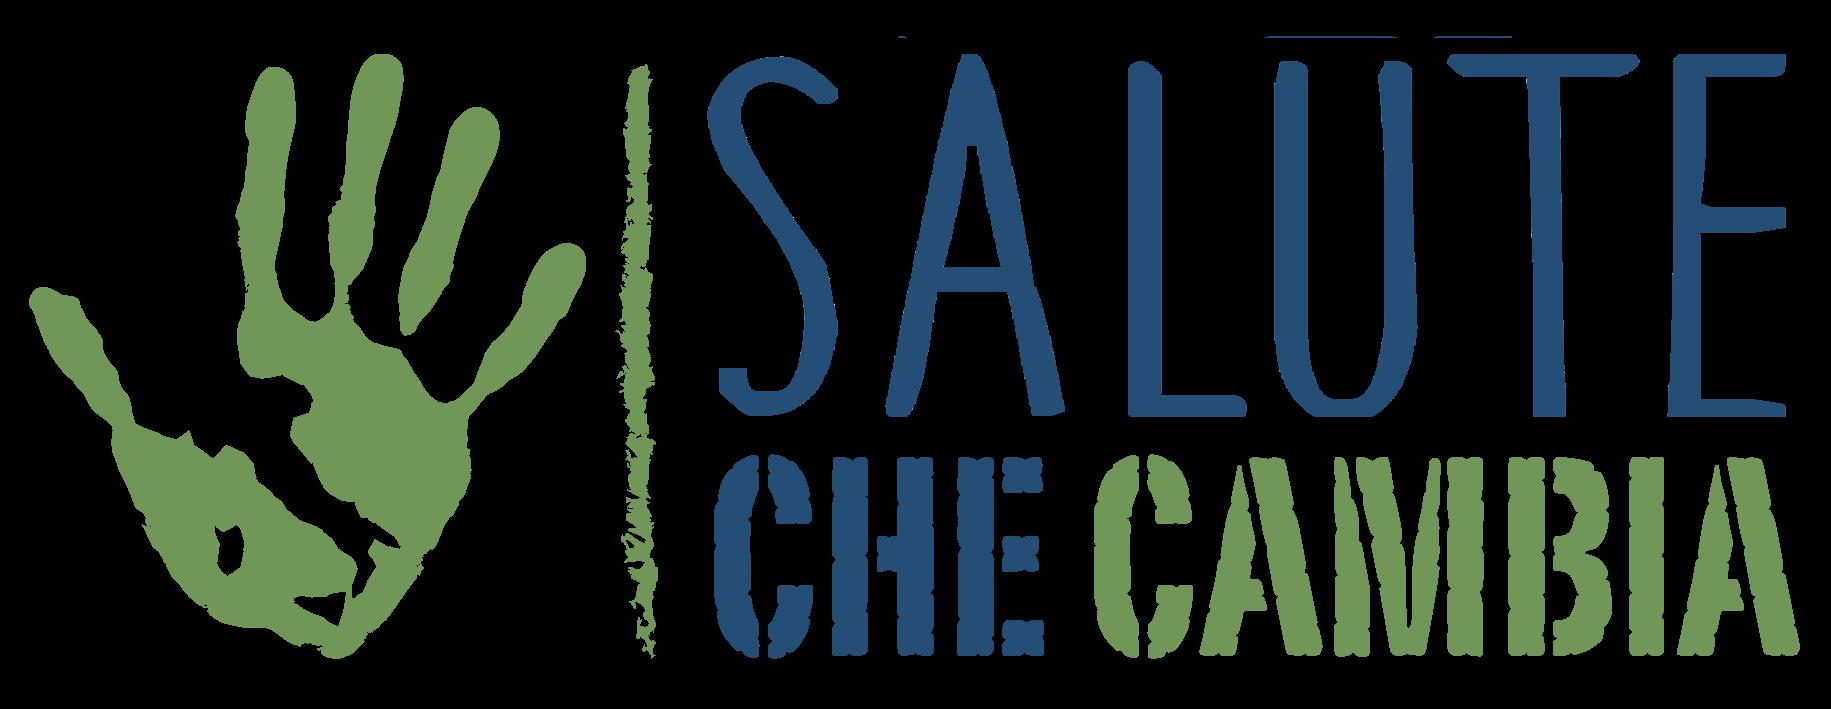 SaluteCheCambia (1)